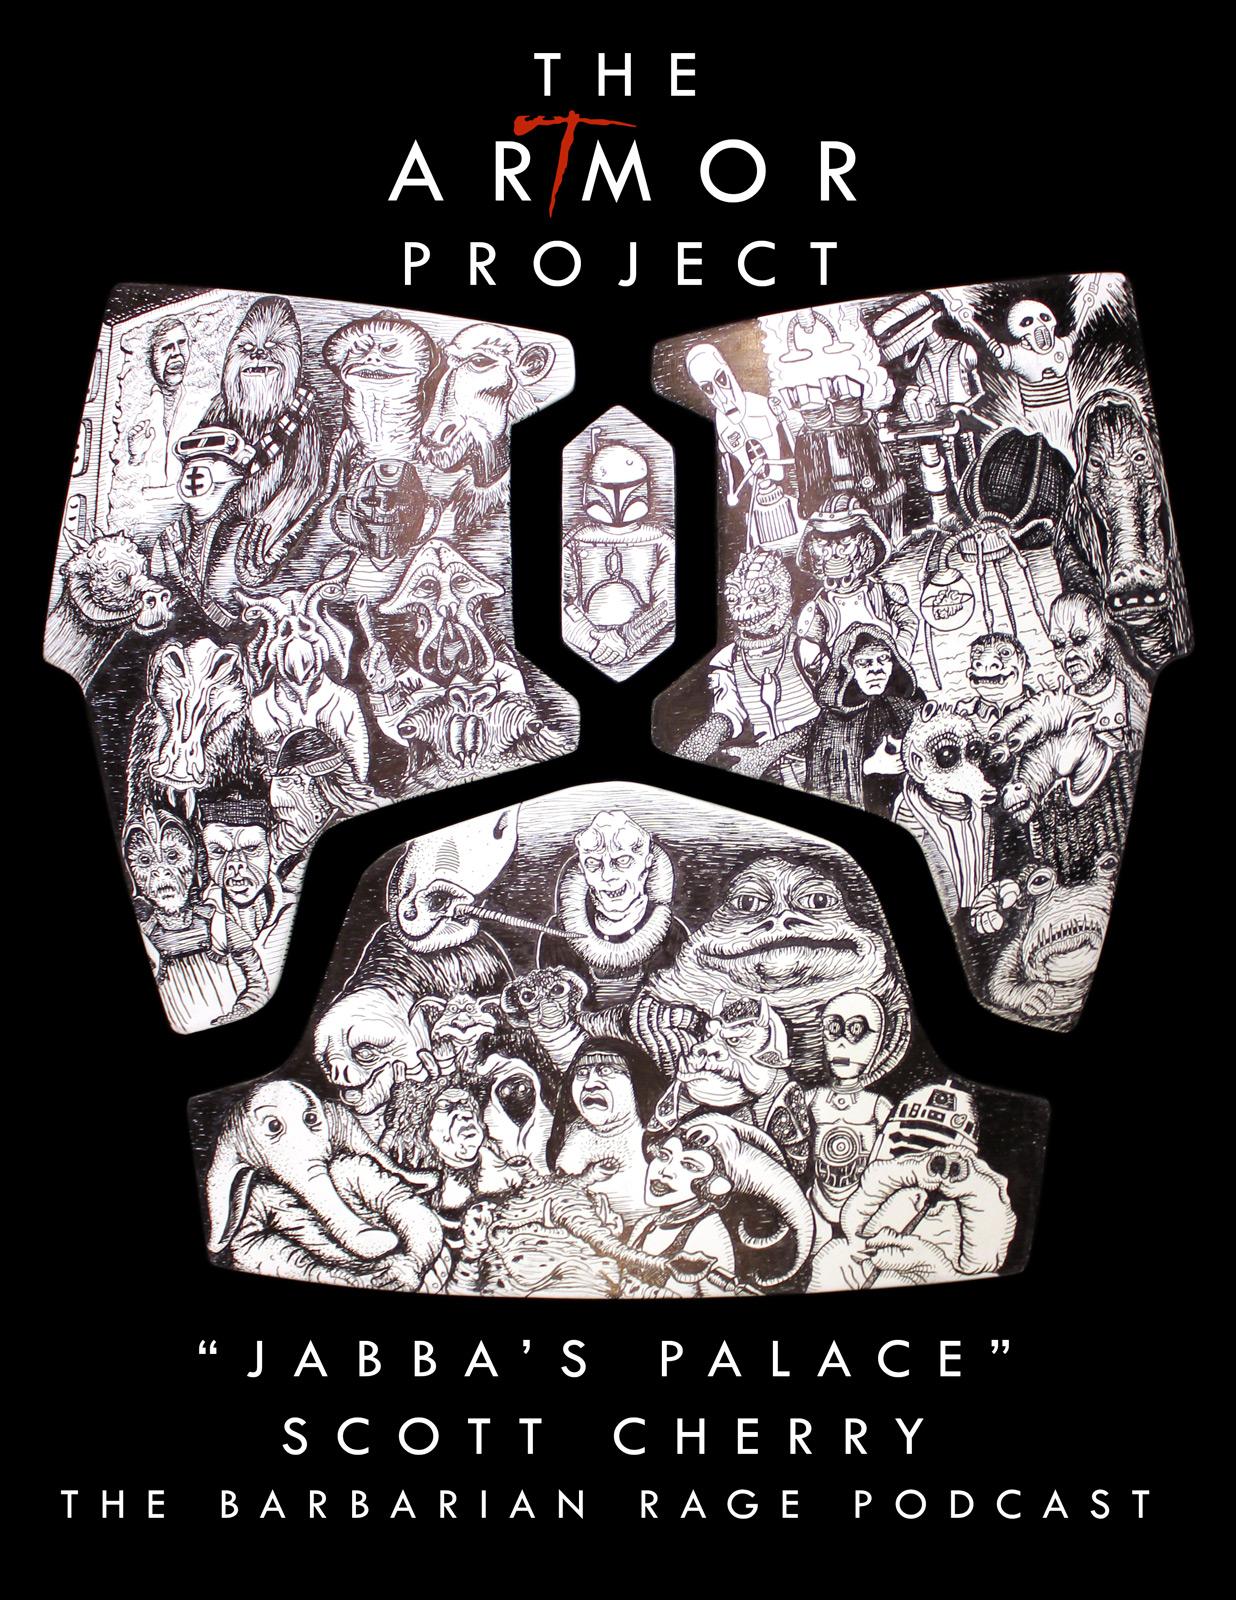 ArTmor 2015: Jabba's Palace